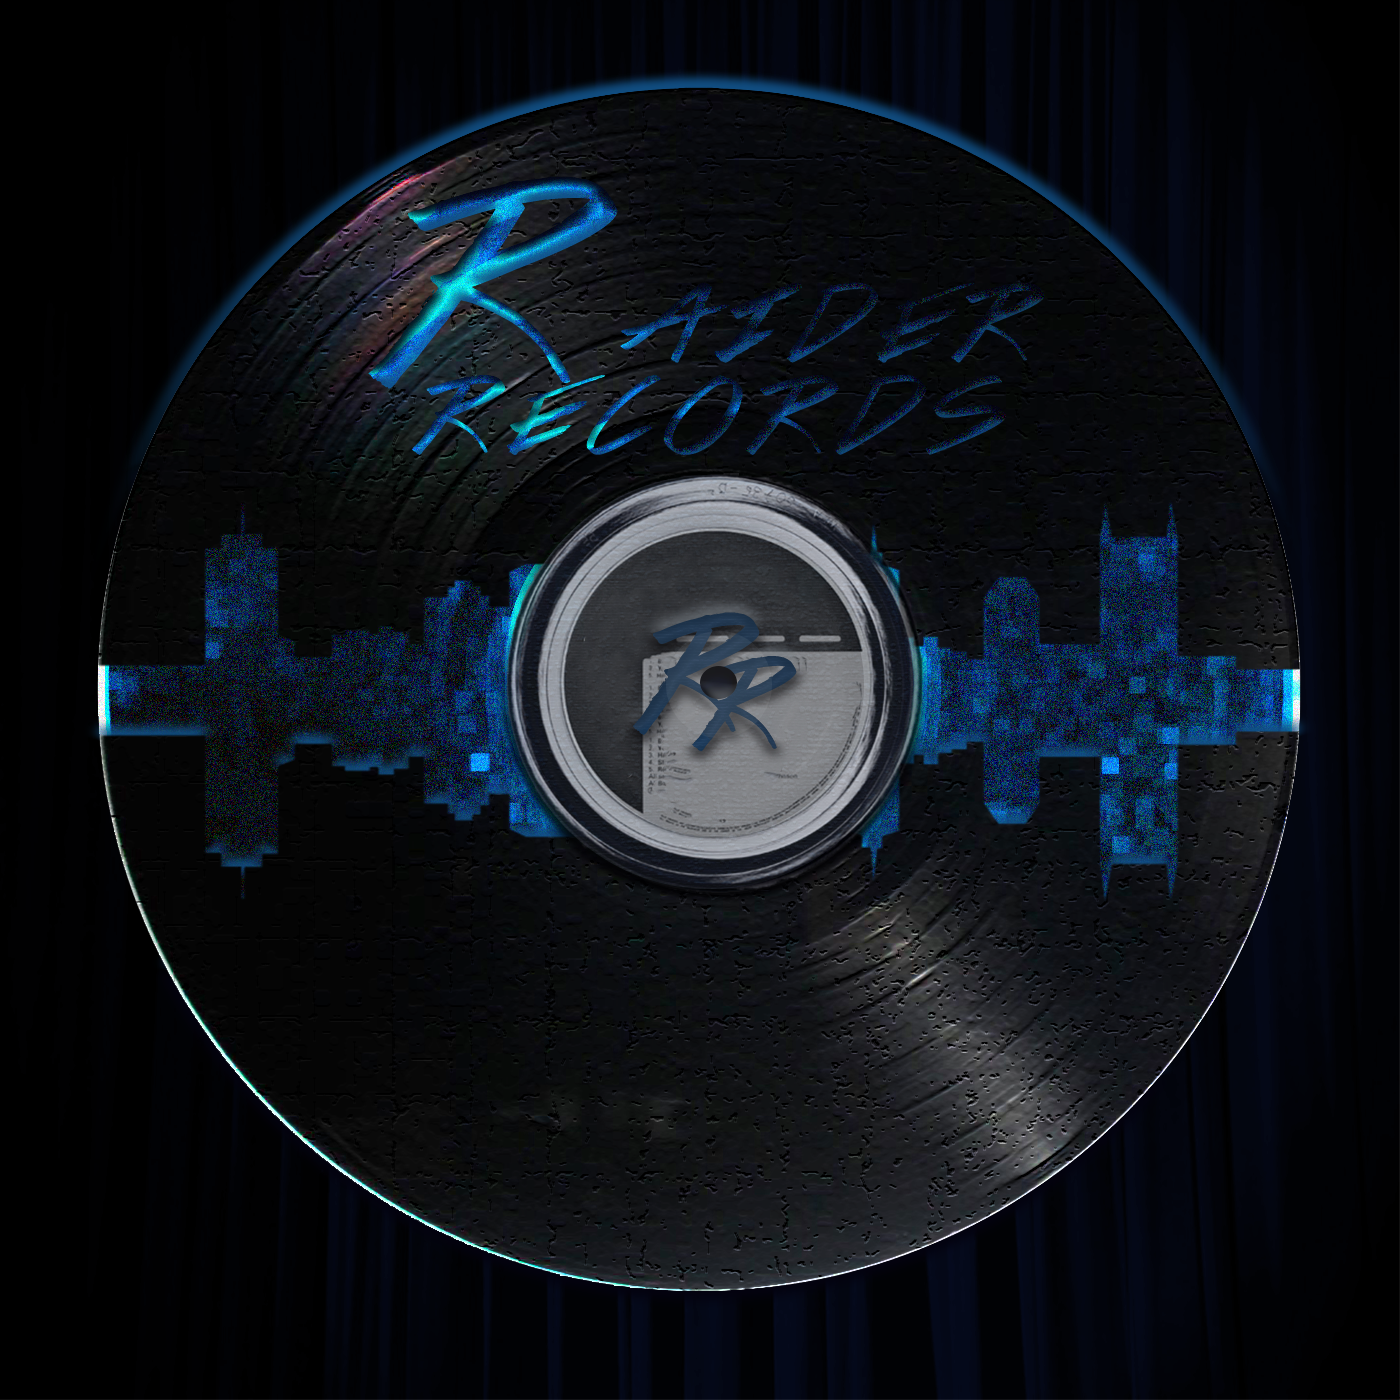 Raider Records